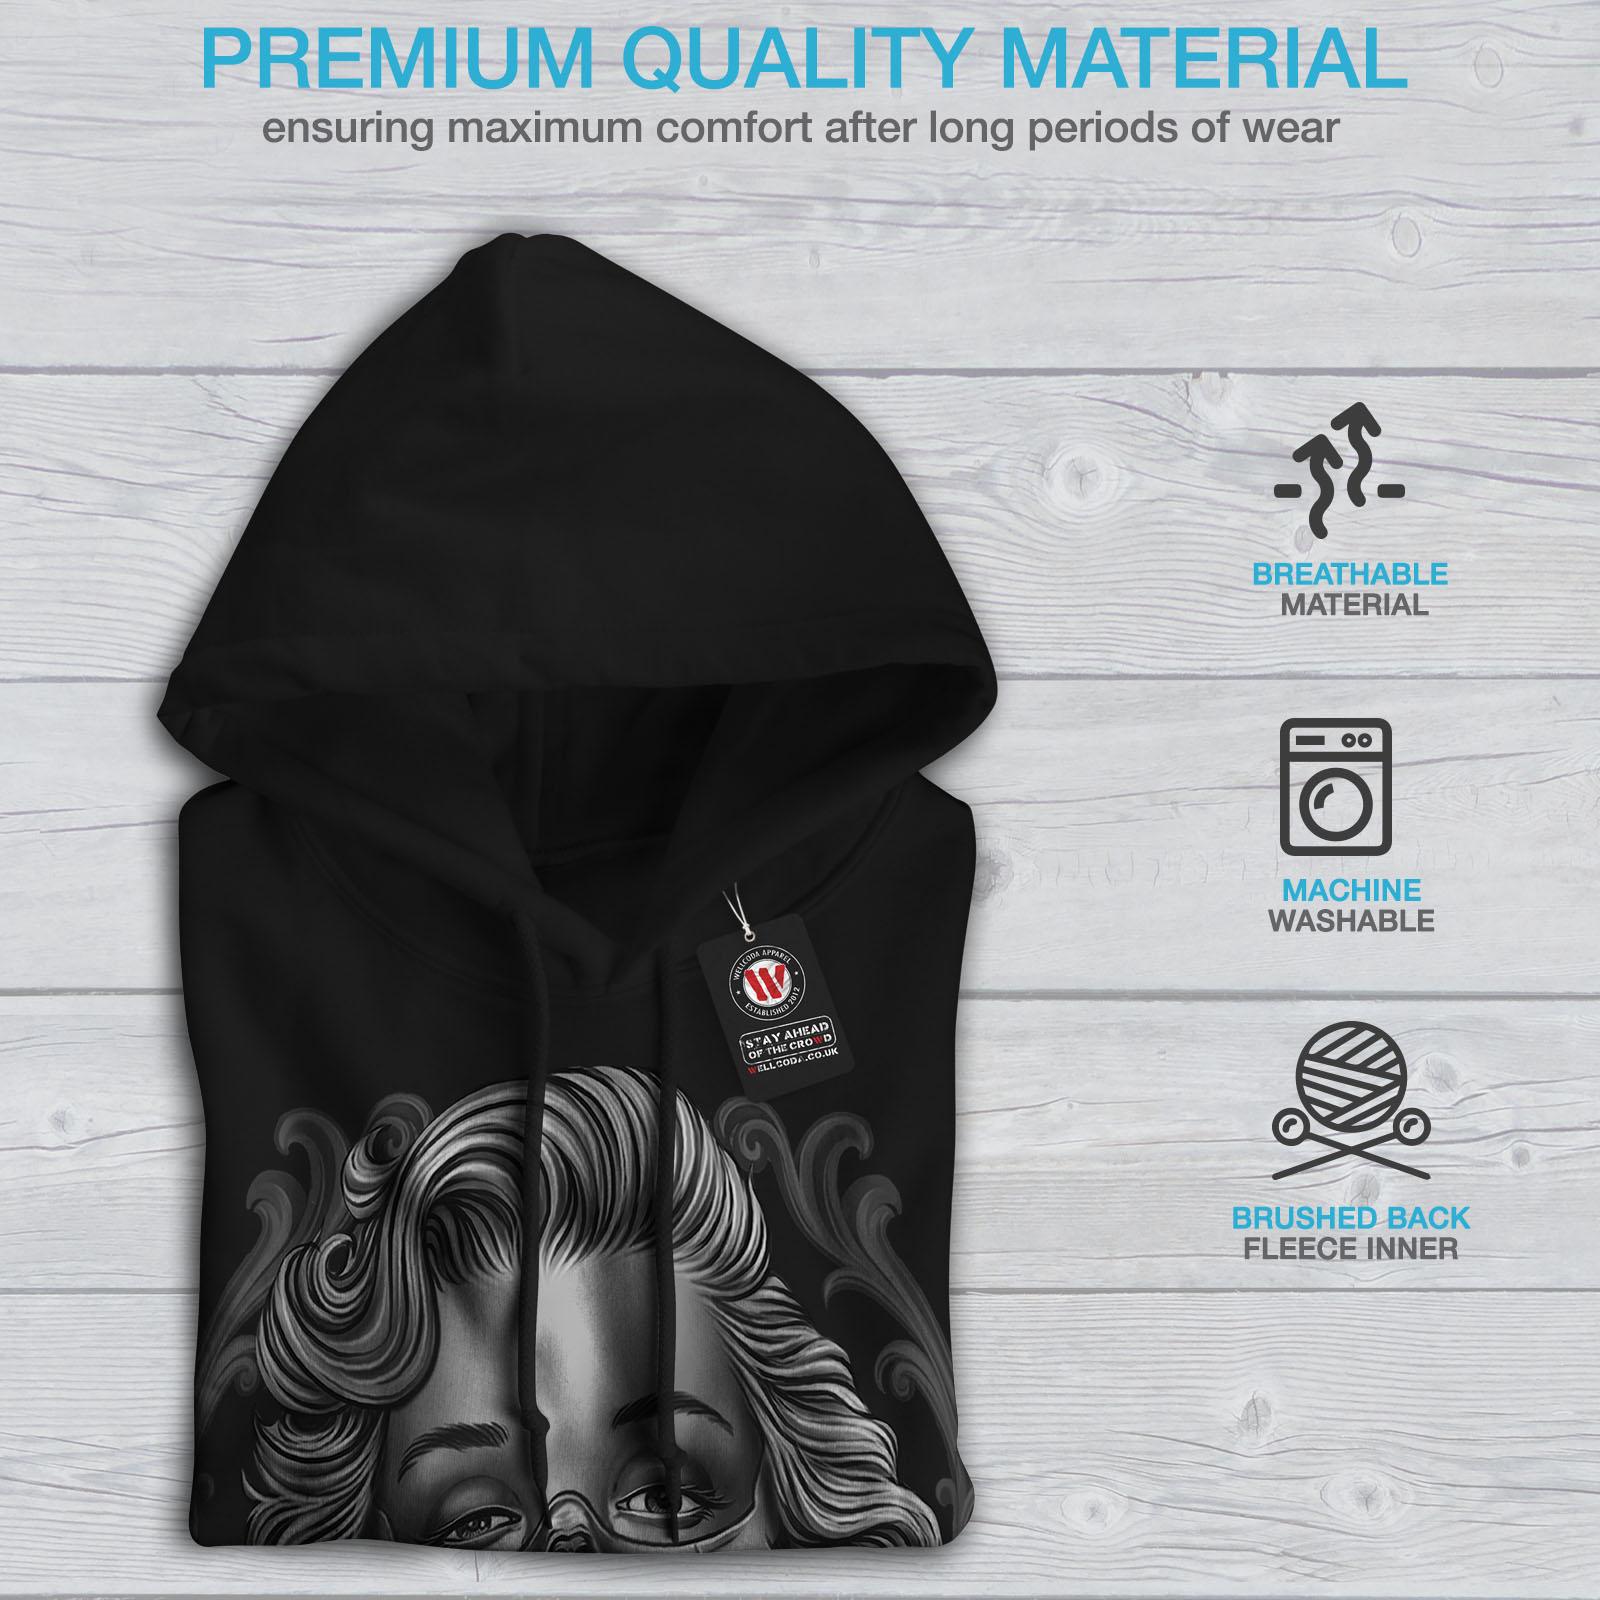 Casual Mens Black Hoodie New Hooded Wellcoda Sweatshirt 5qx7tSw5W